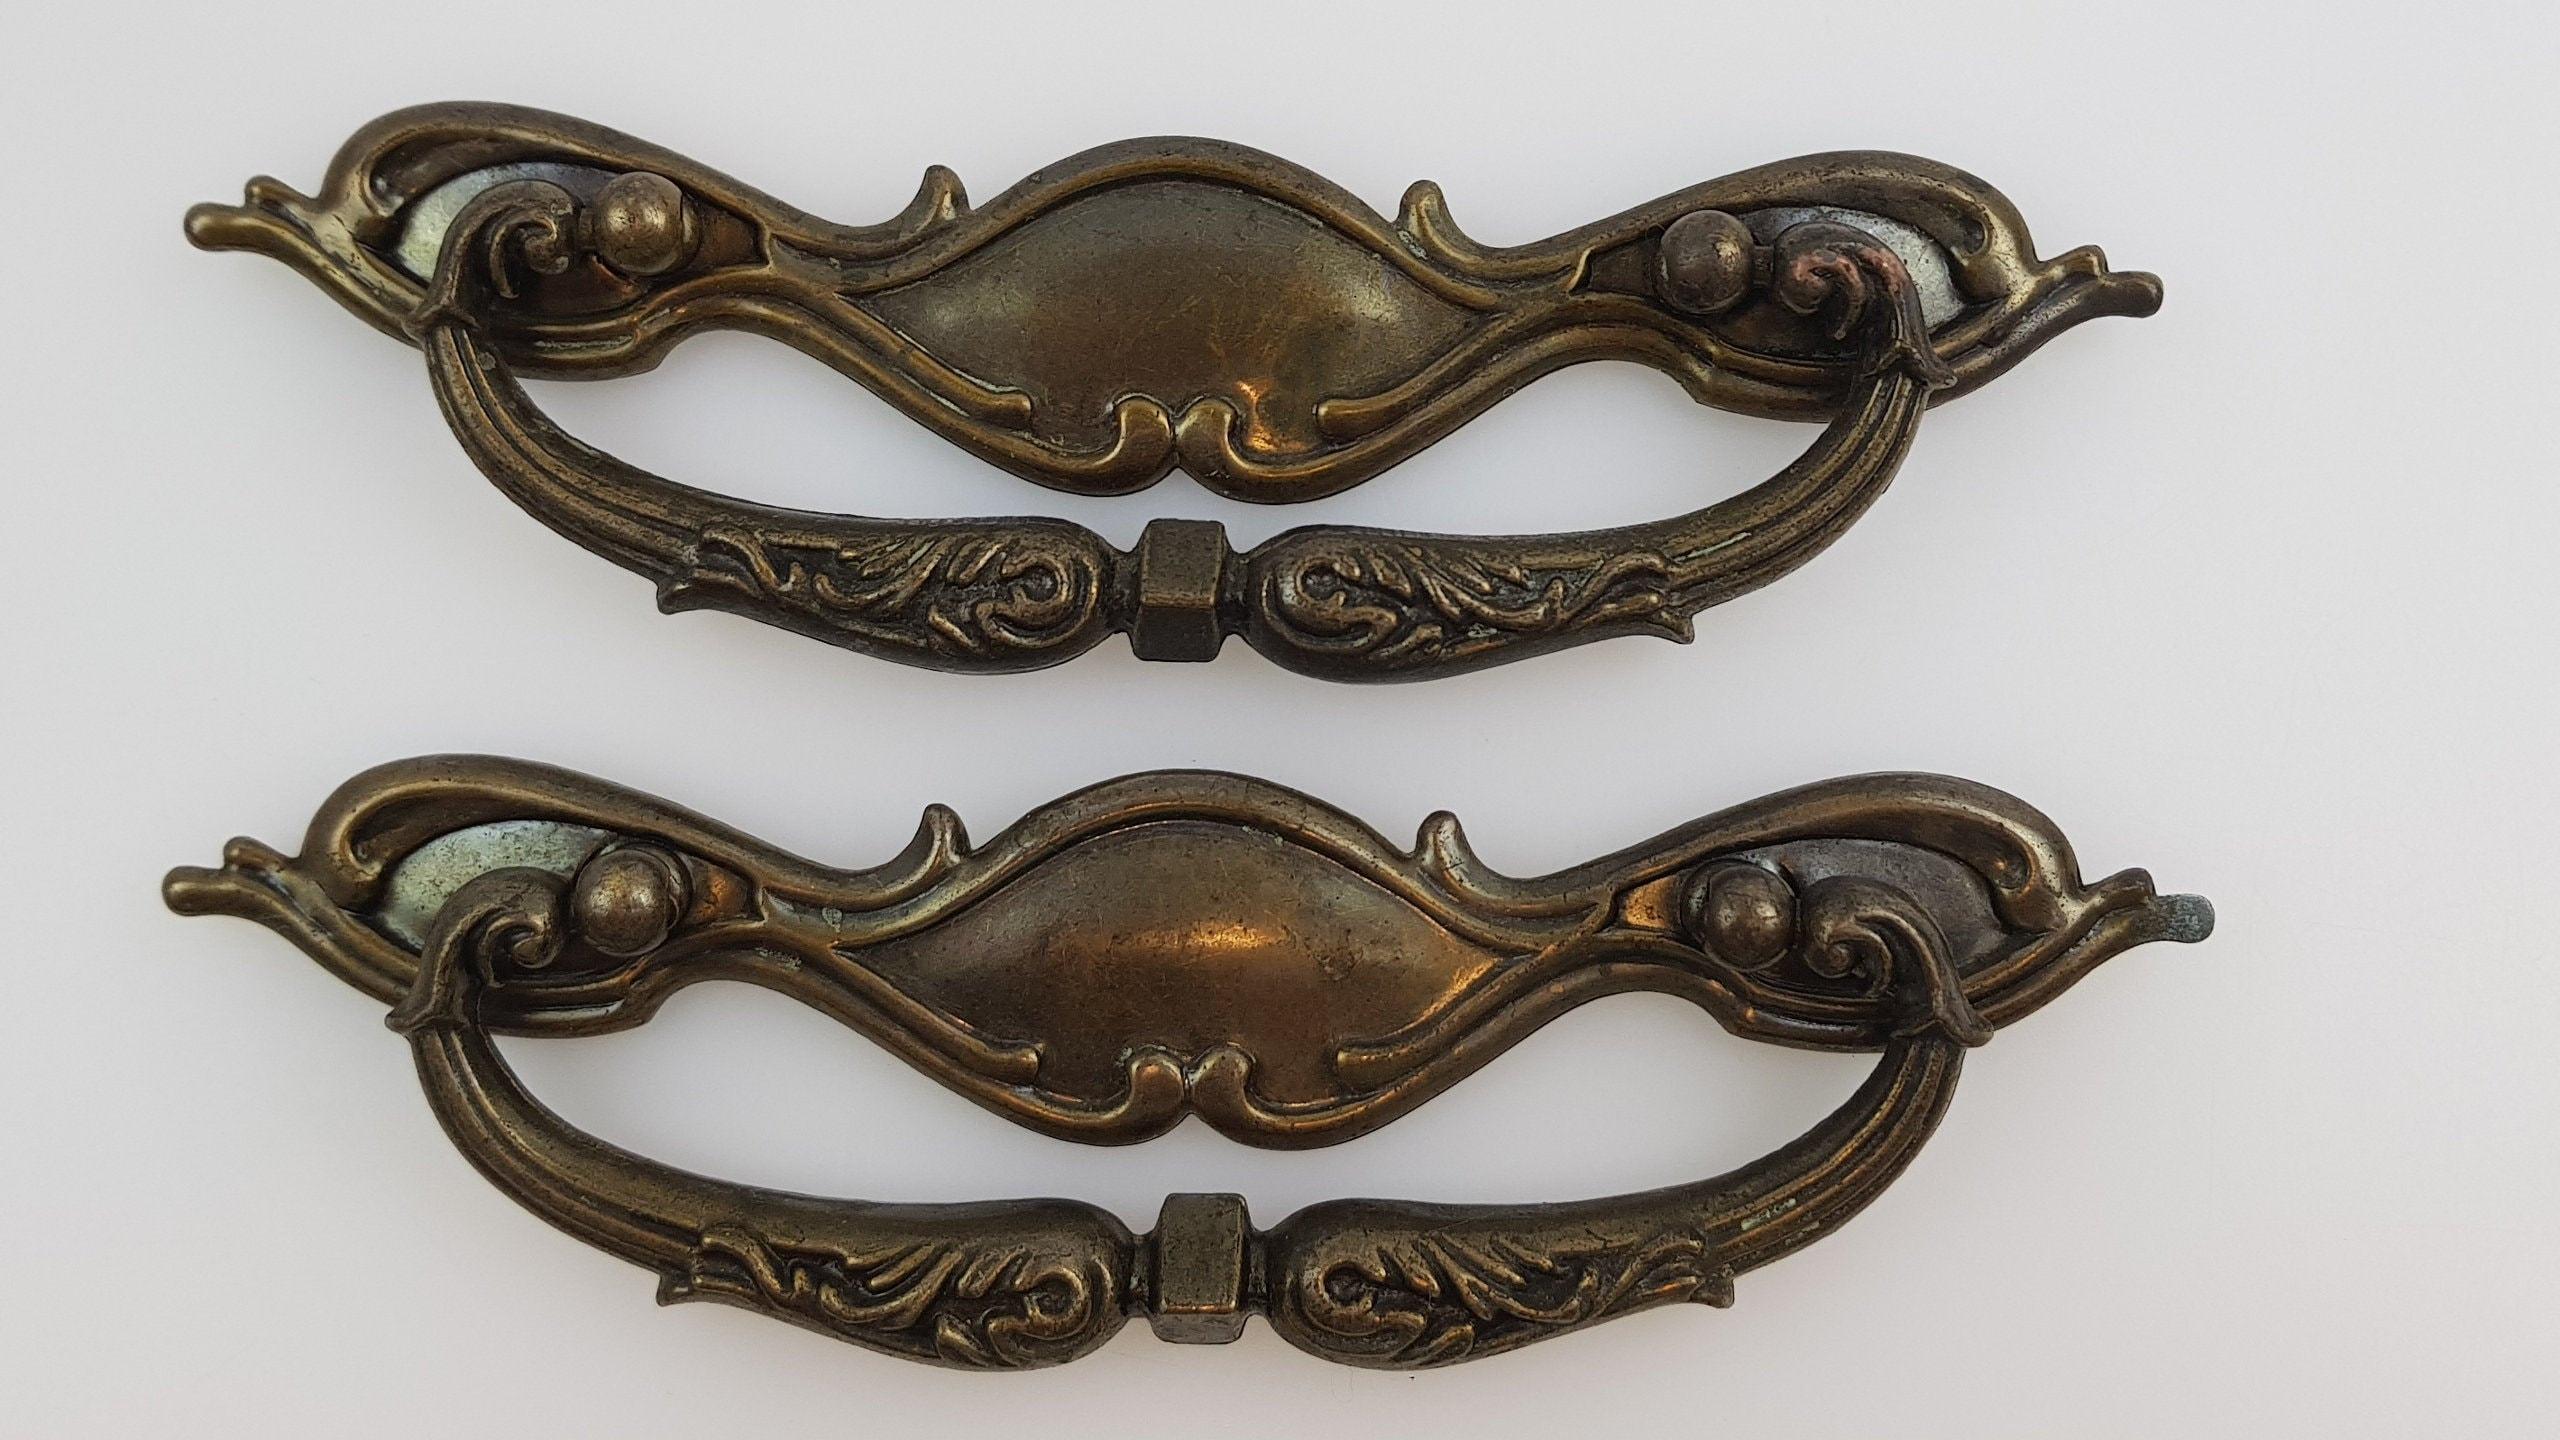 Vintage NOS Polished BRASS Plated Drawer //Cabinet Door Pull Handle Ajax Art Deco